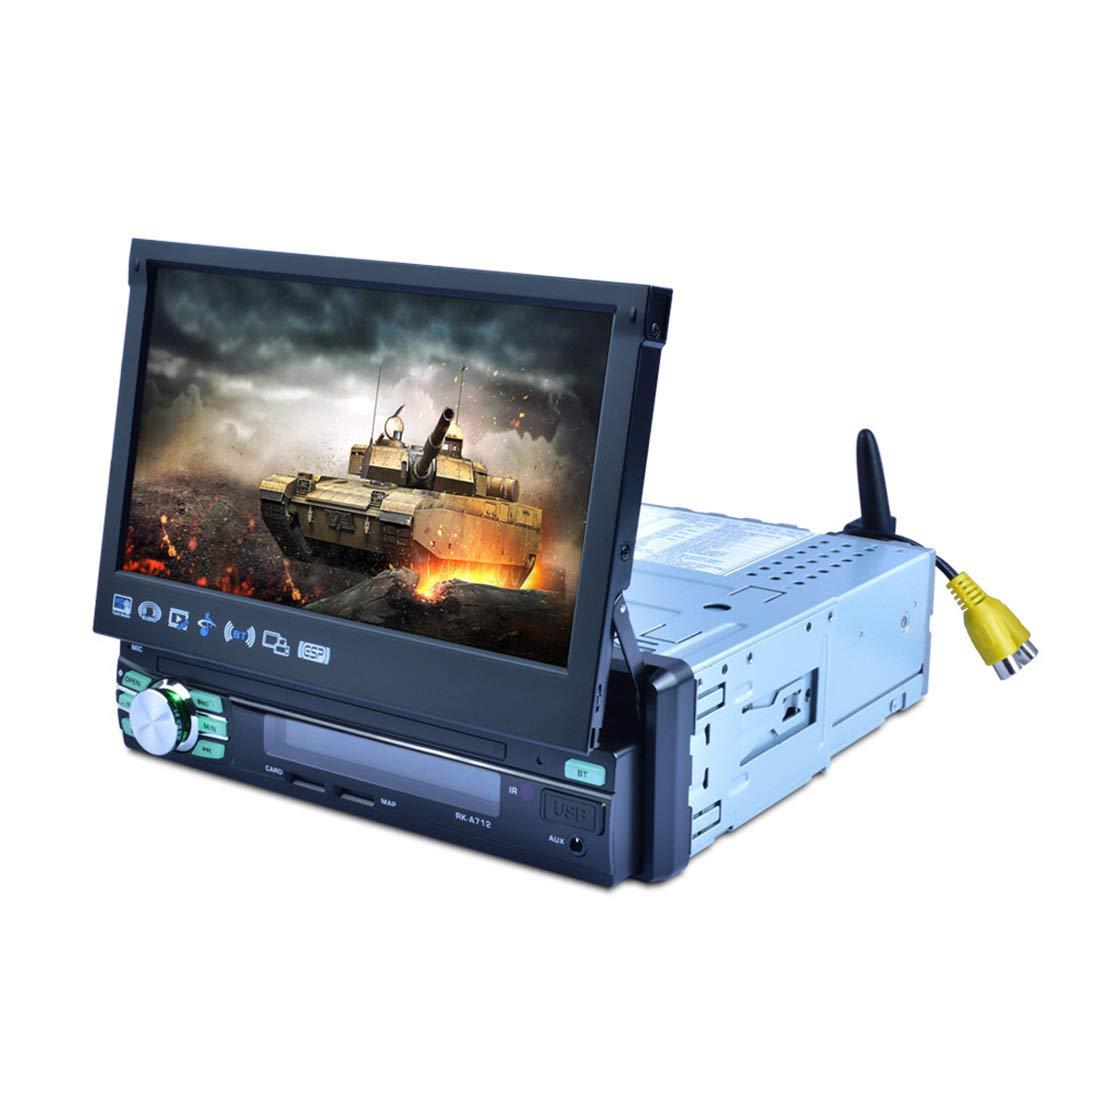 YVSoo 1 DIN Navegador GPS Autoradio Pantalla Retrá ctil para Coche, 7' 1080P Bluetooth Reproductor MP5 Radio Am/FM/RDS con Mapa, Conducir Grabadora, Control de Volante 7 1080P Bluetooth Reproductor MP5 Radio Am/FM/RDS con Mapa